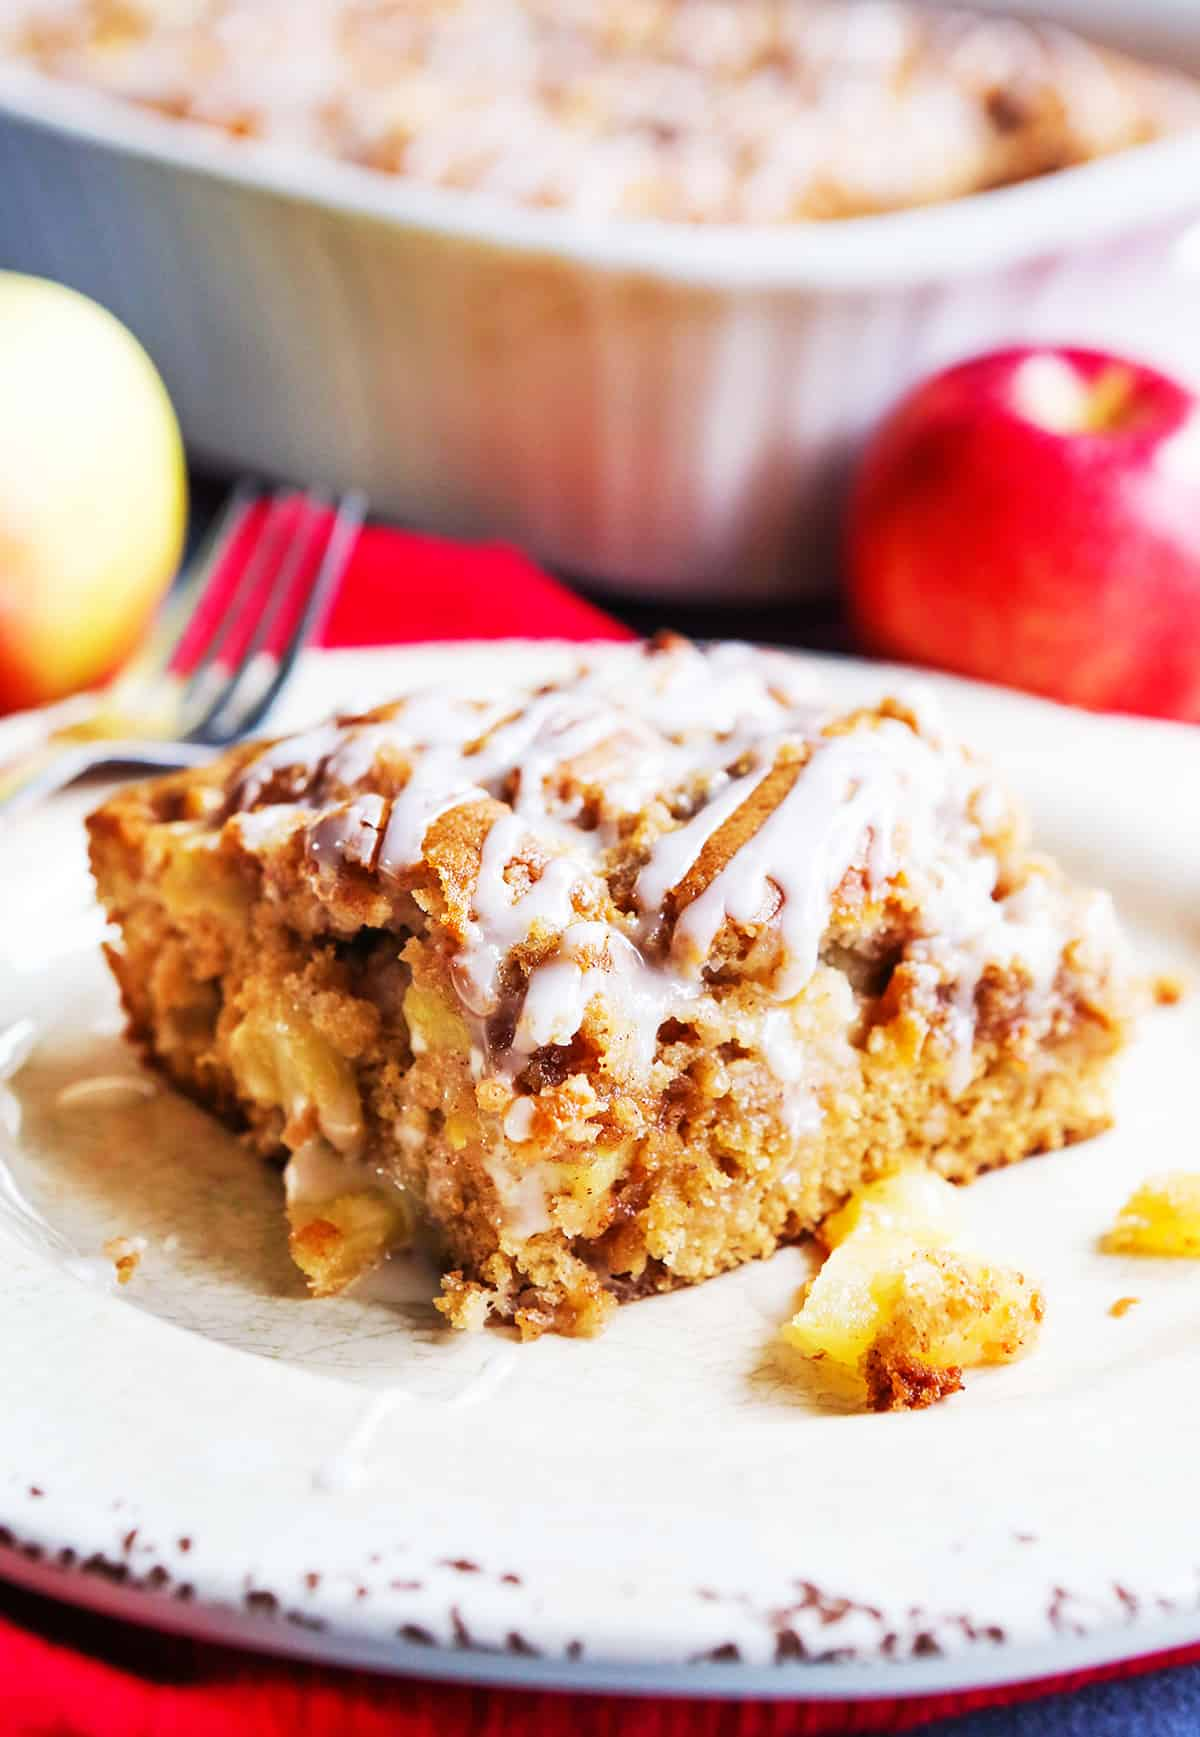 slice of apple coffee cake sitting next to pan.